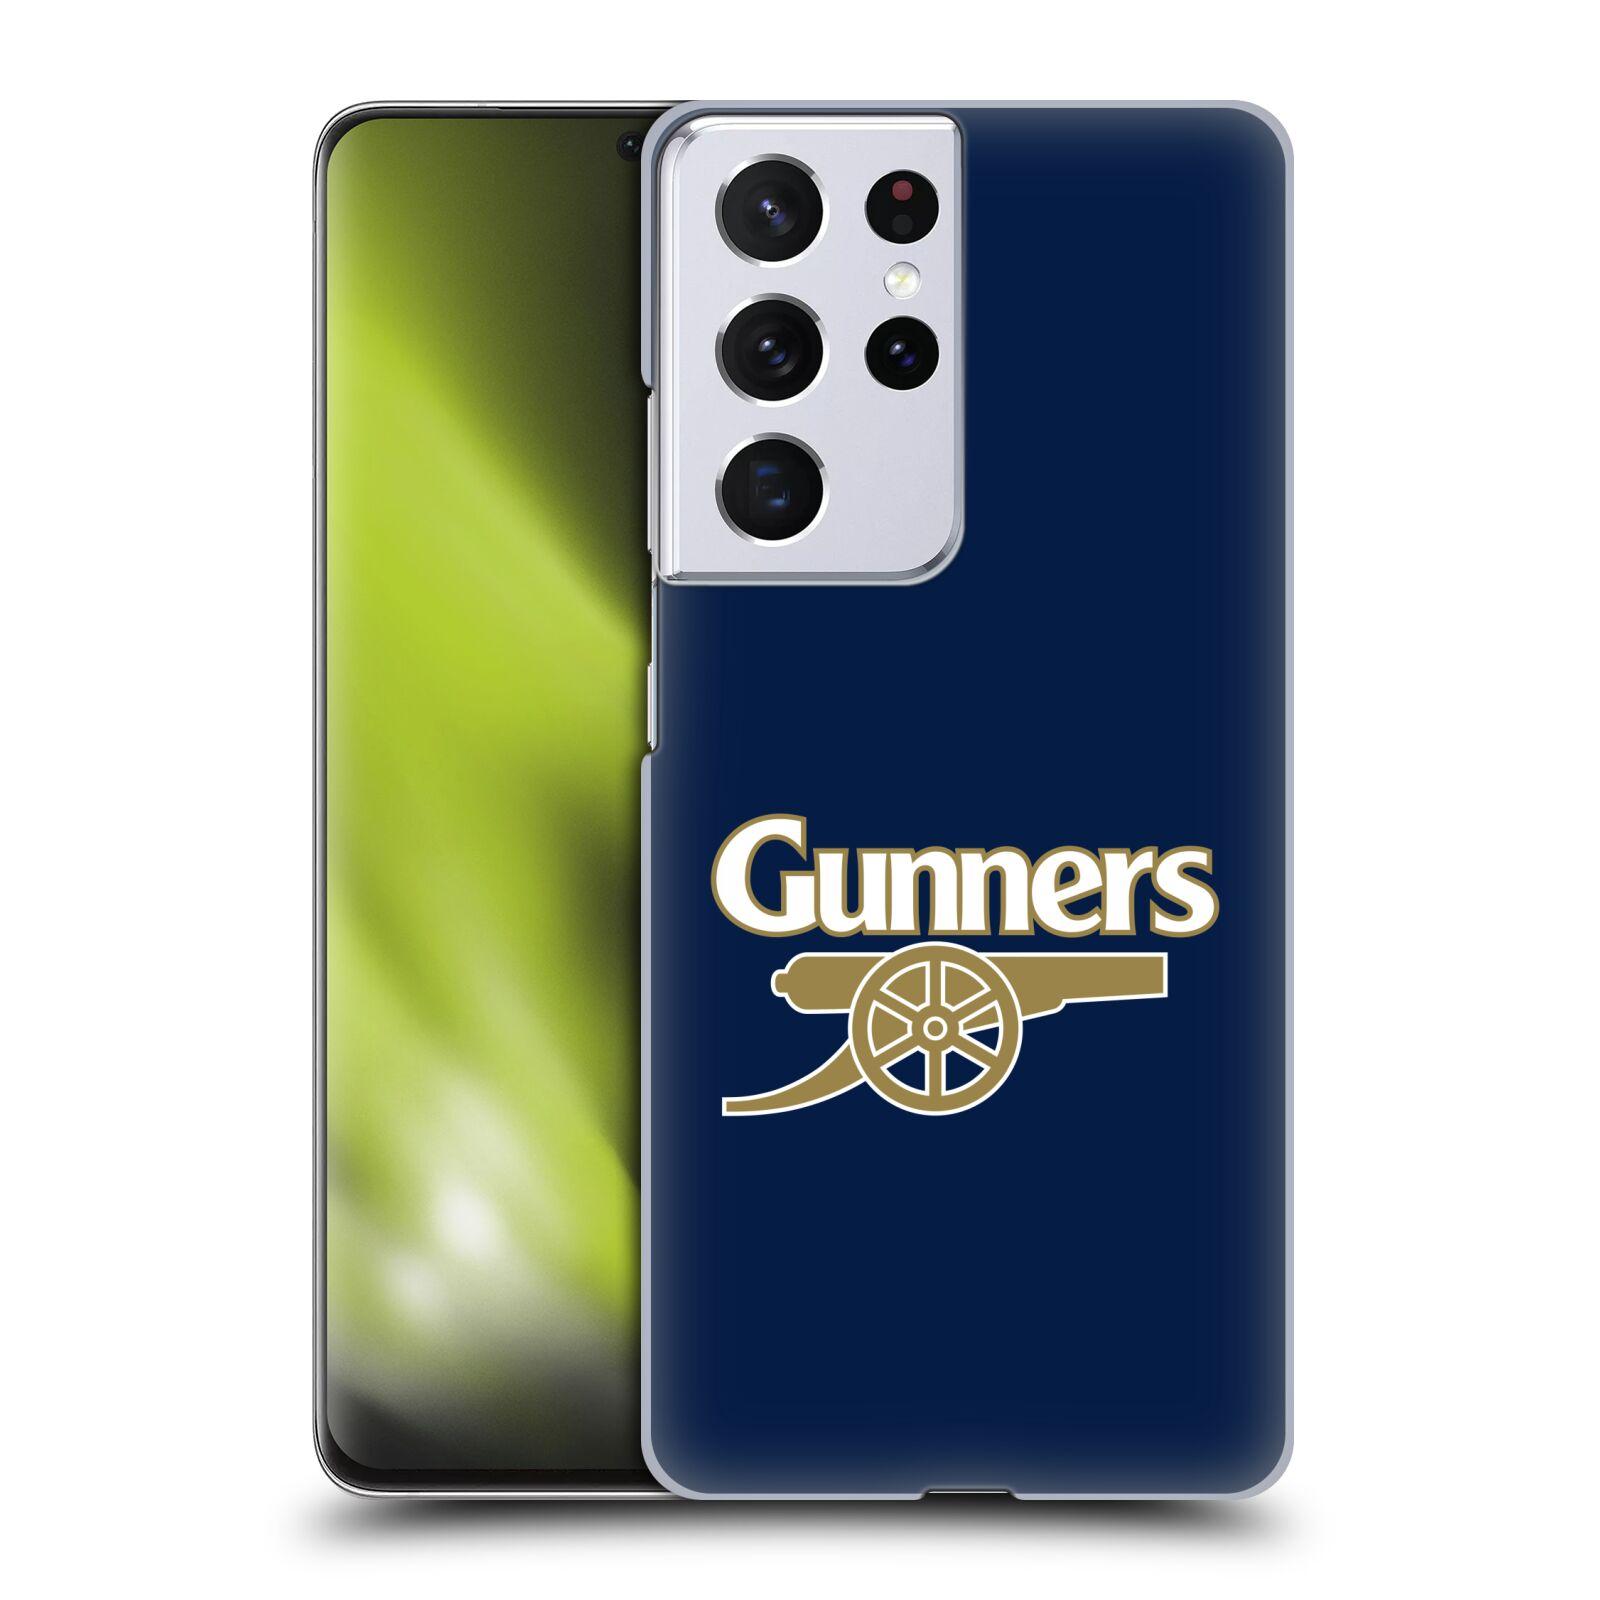 Plastové pouzdro na mobil Samsung Galaxy S21 Ultra 5G - Head Case - Arsenal FC - Gunners